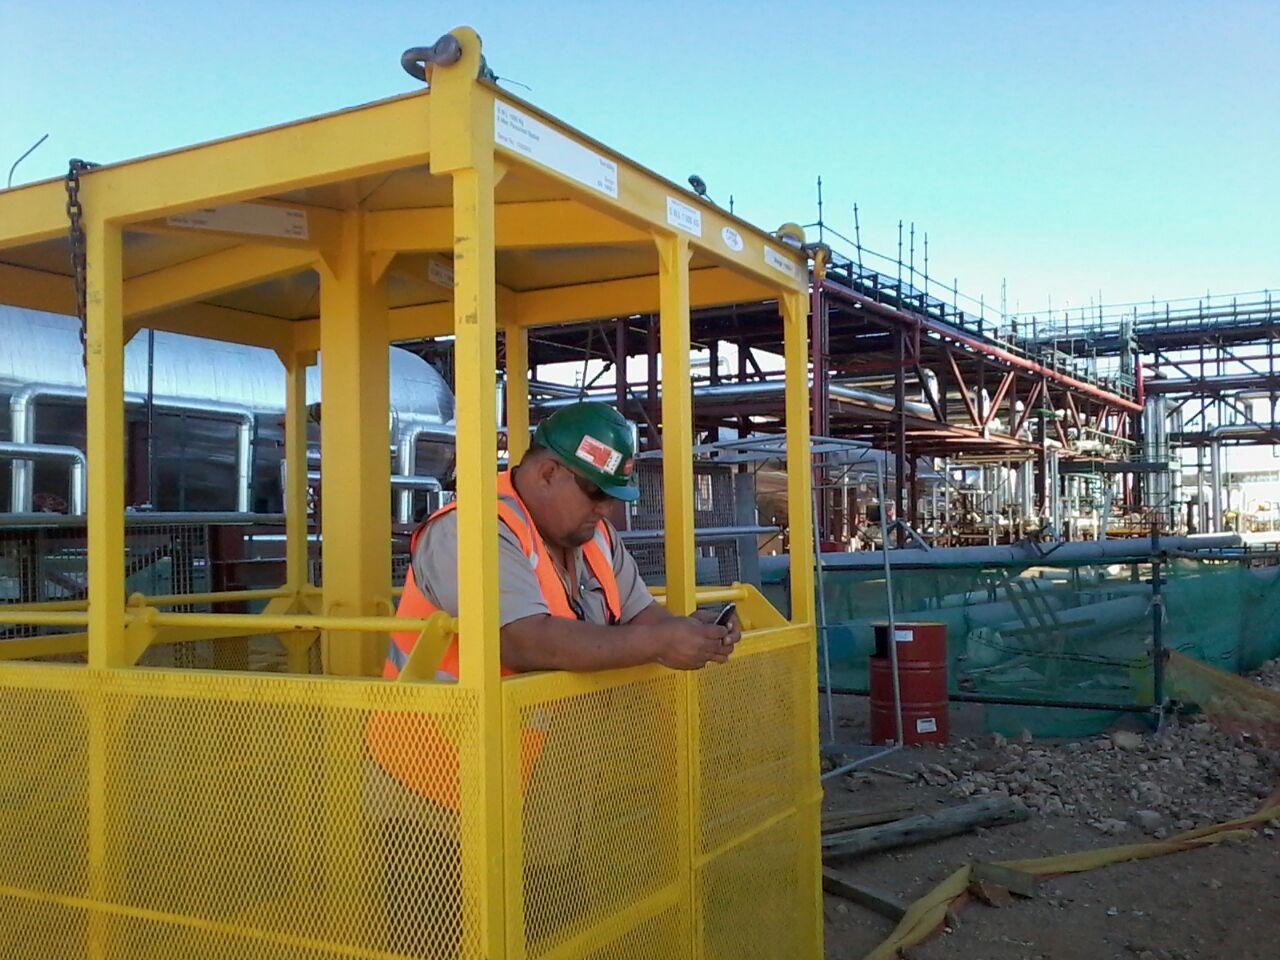 Man Cages  - Designed, Manufactured, Certified  Load tested  Fastlift Cranes  Service